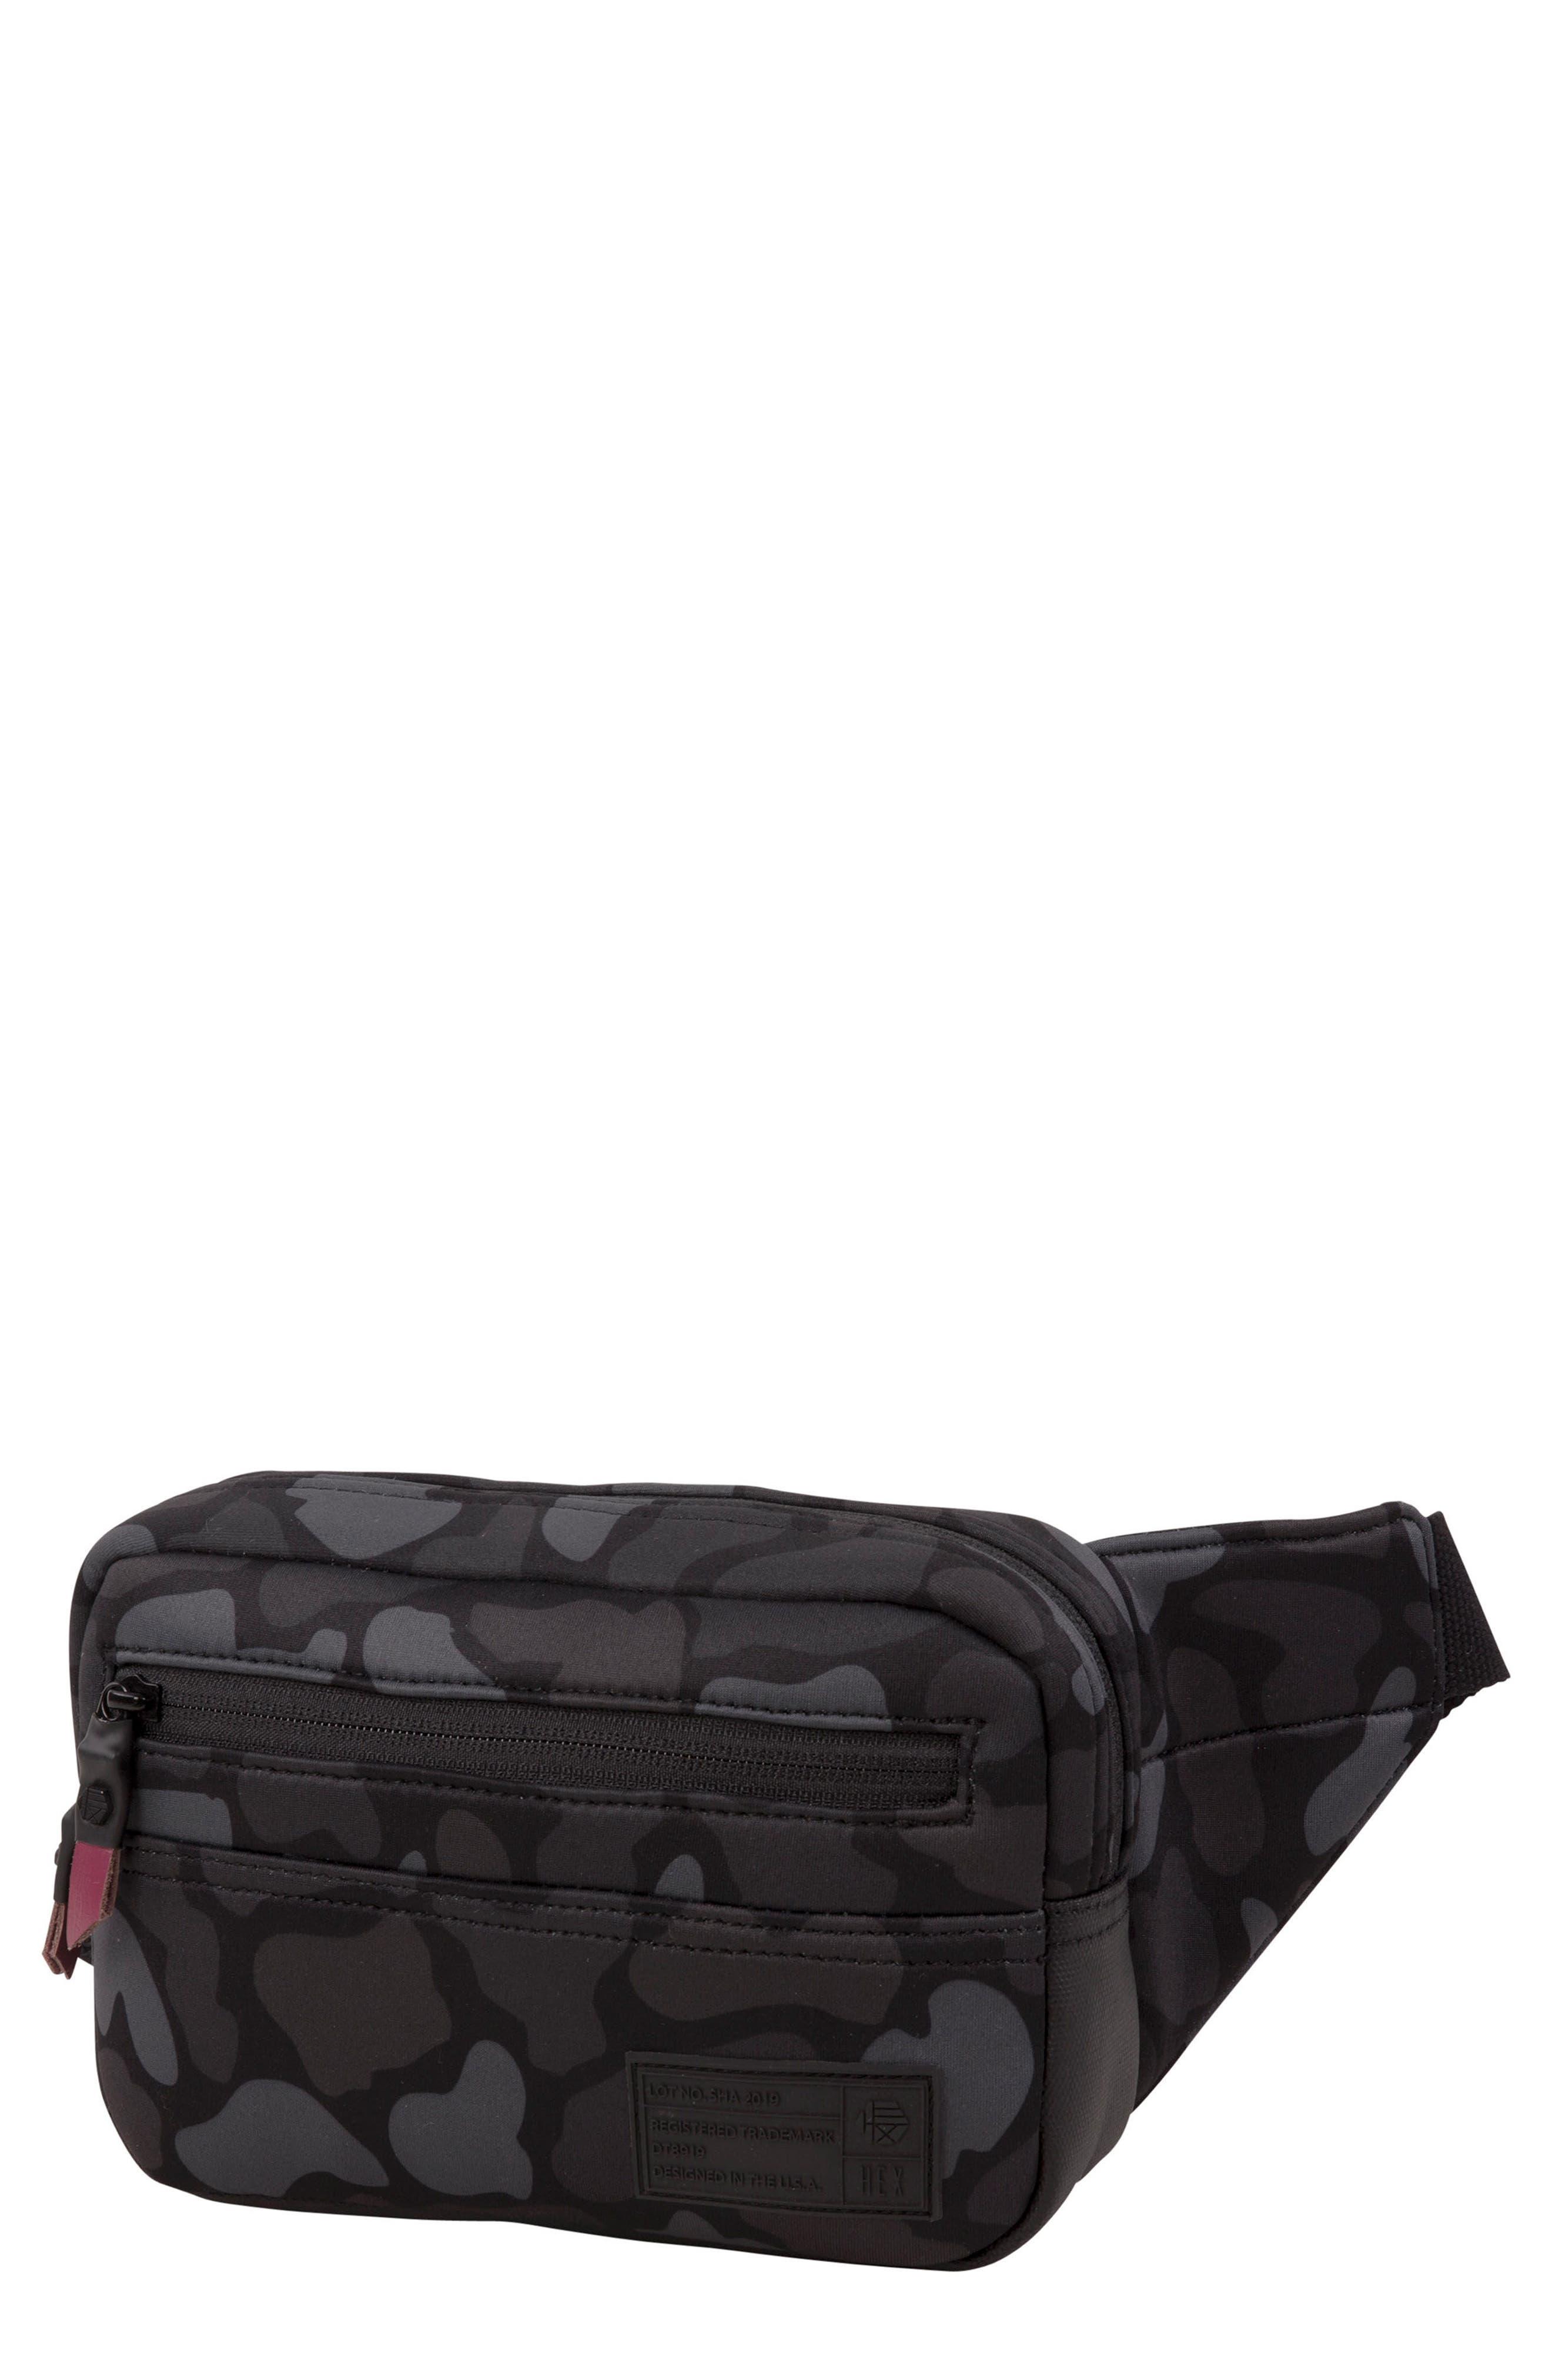 Belt Bag,                         Main,                         color, CAMO NEOPRENE